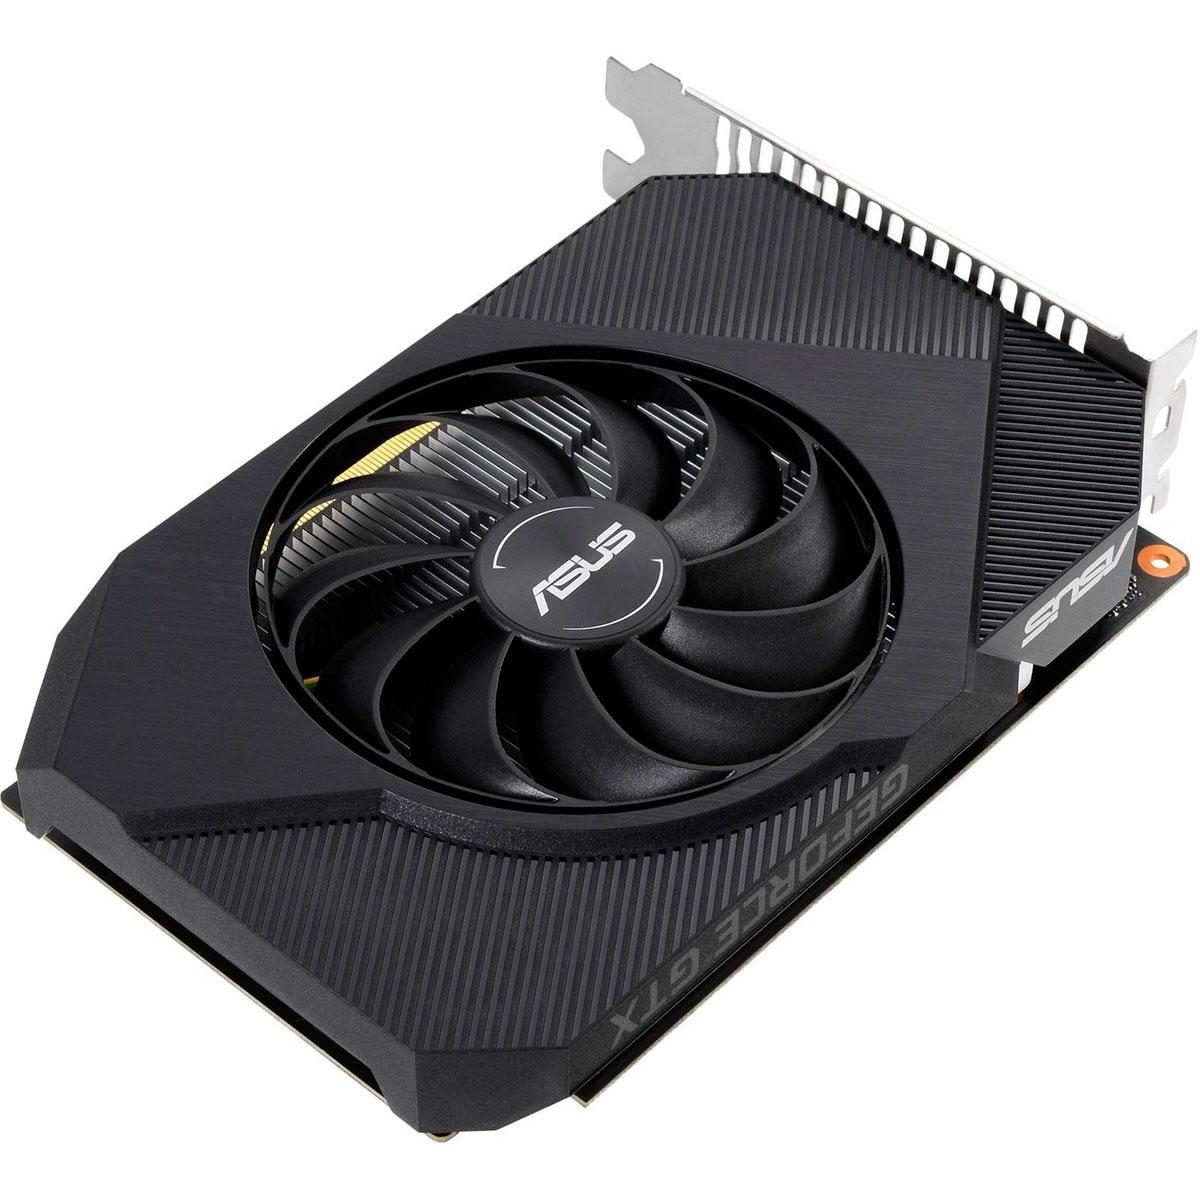 Placa de Vídeo Asus GeForce GTX 1650 OC Edition Phoenix GDDR6 4GB 128 Bits - PH-GTX1650-O4GD6-P